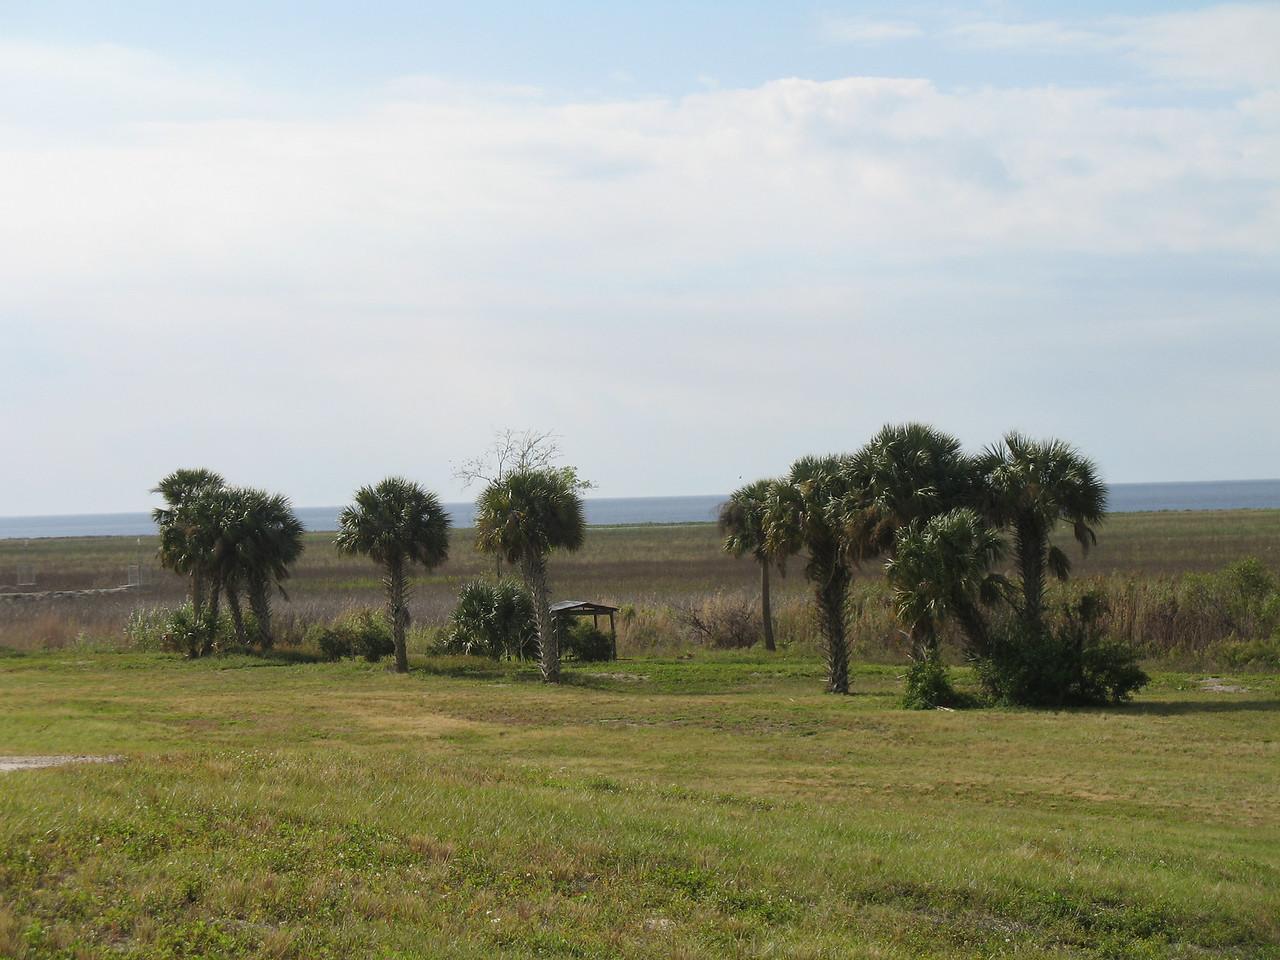 Campsite at Nubbin Slough<br /> PHOTO CREDIT: Sandra Friend / Florida Trail Association